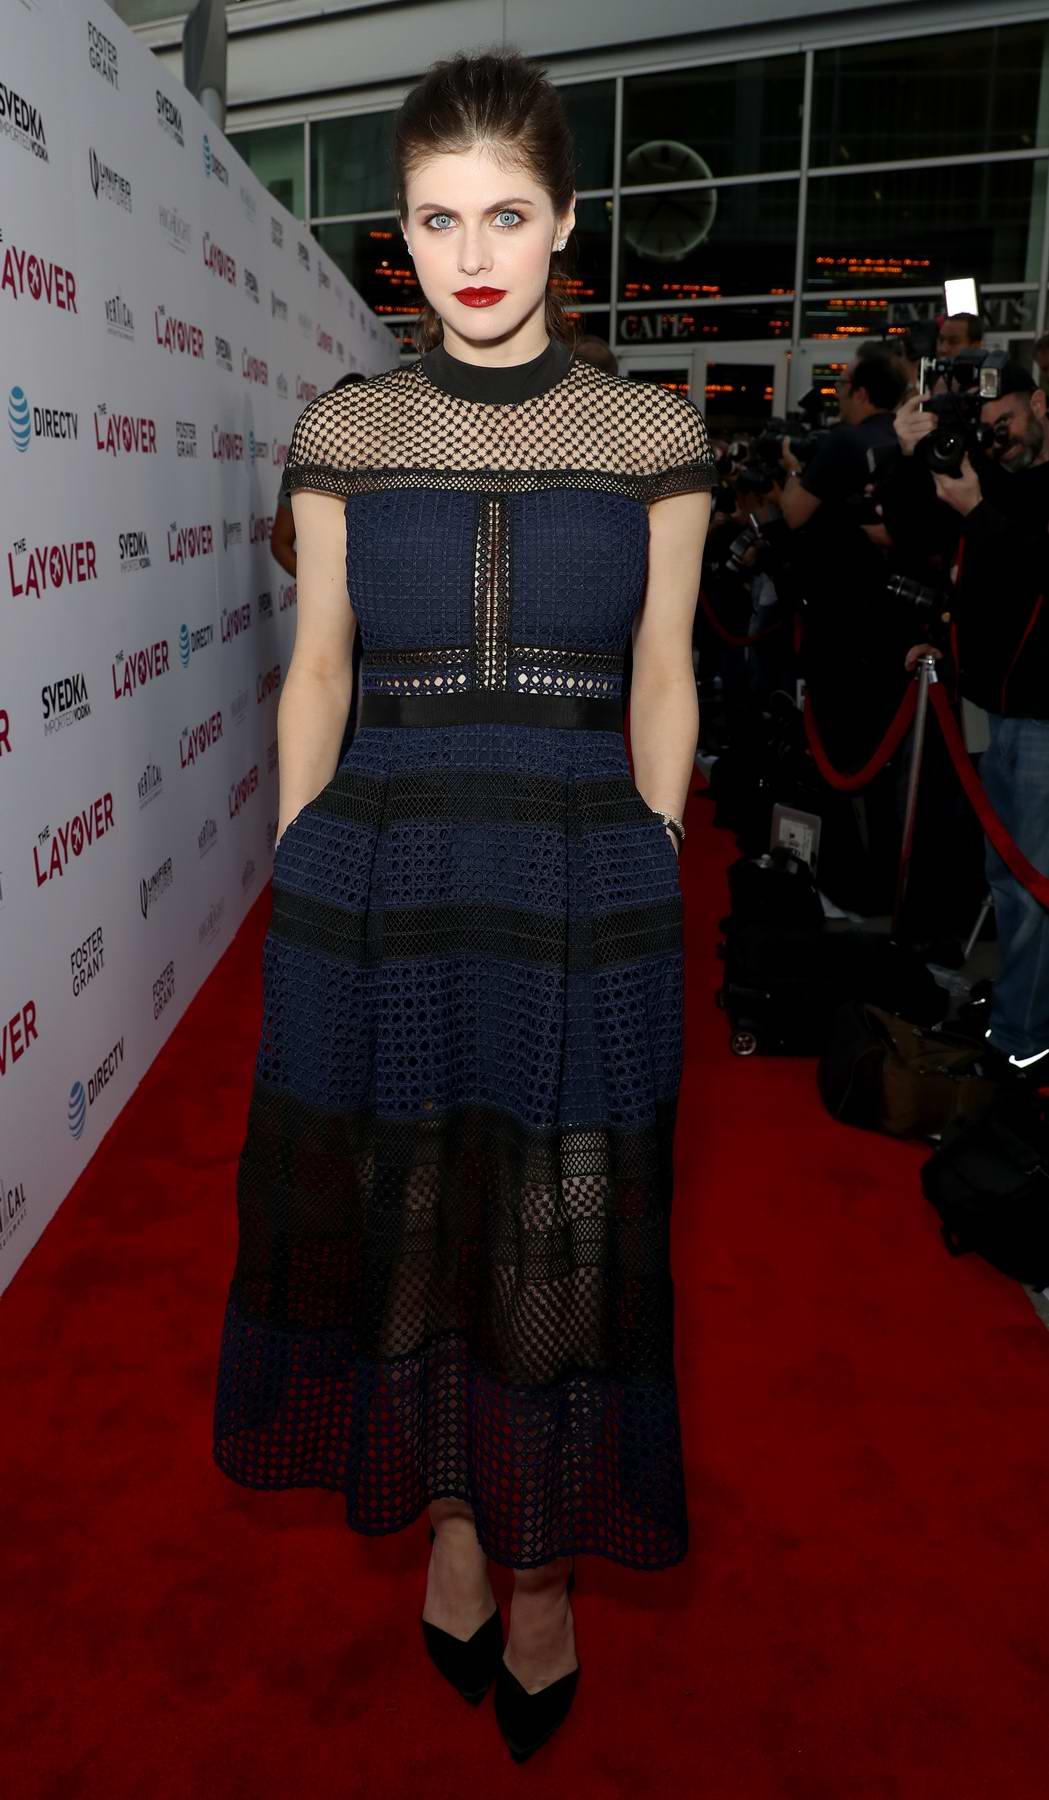 Alexandra Daddario at The Layover film premiere in Los Angeles